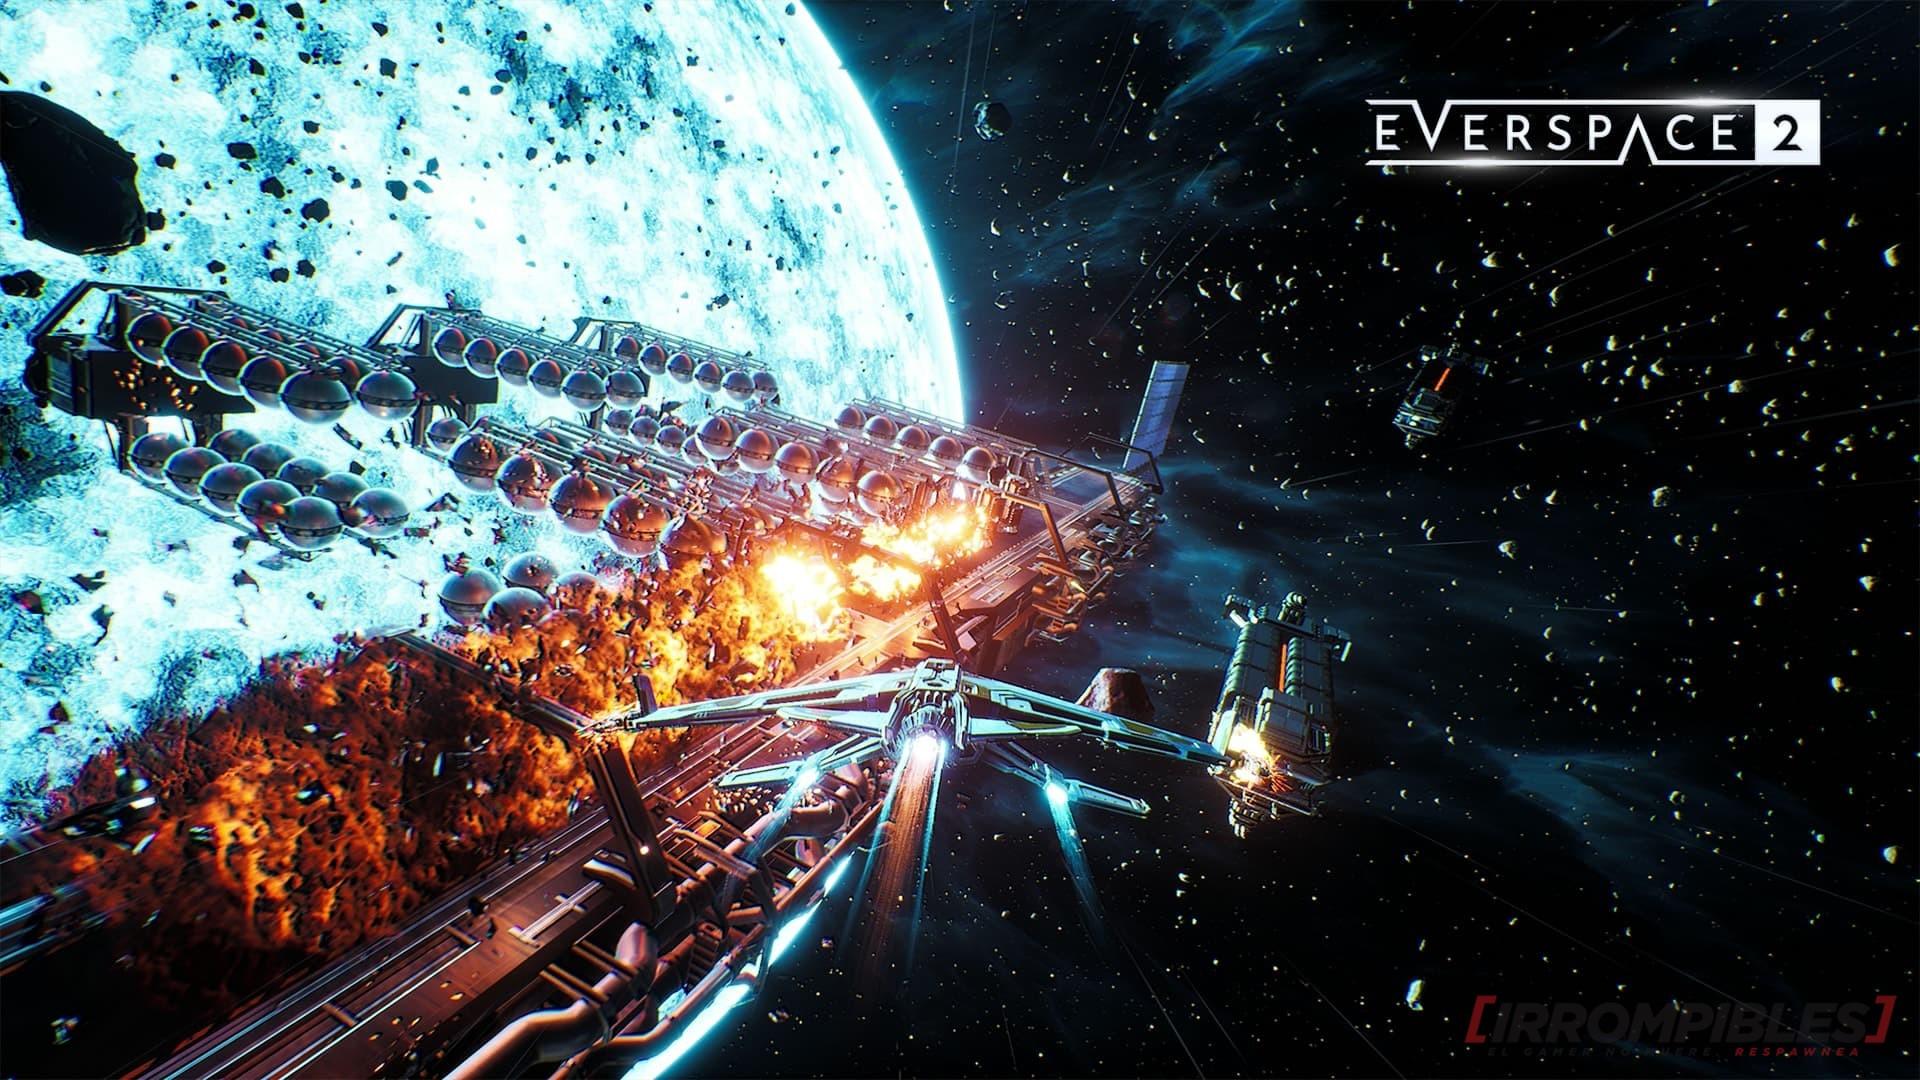 evespace 2 head